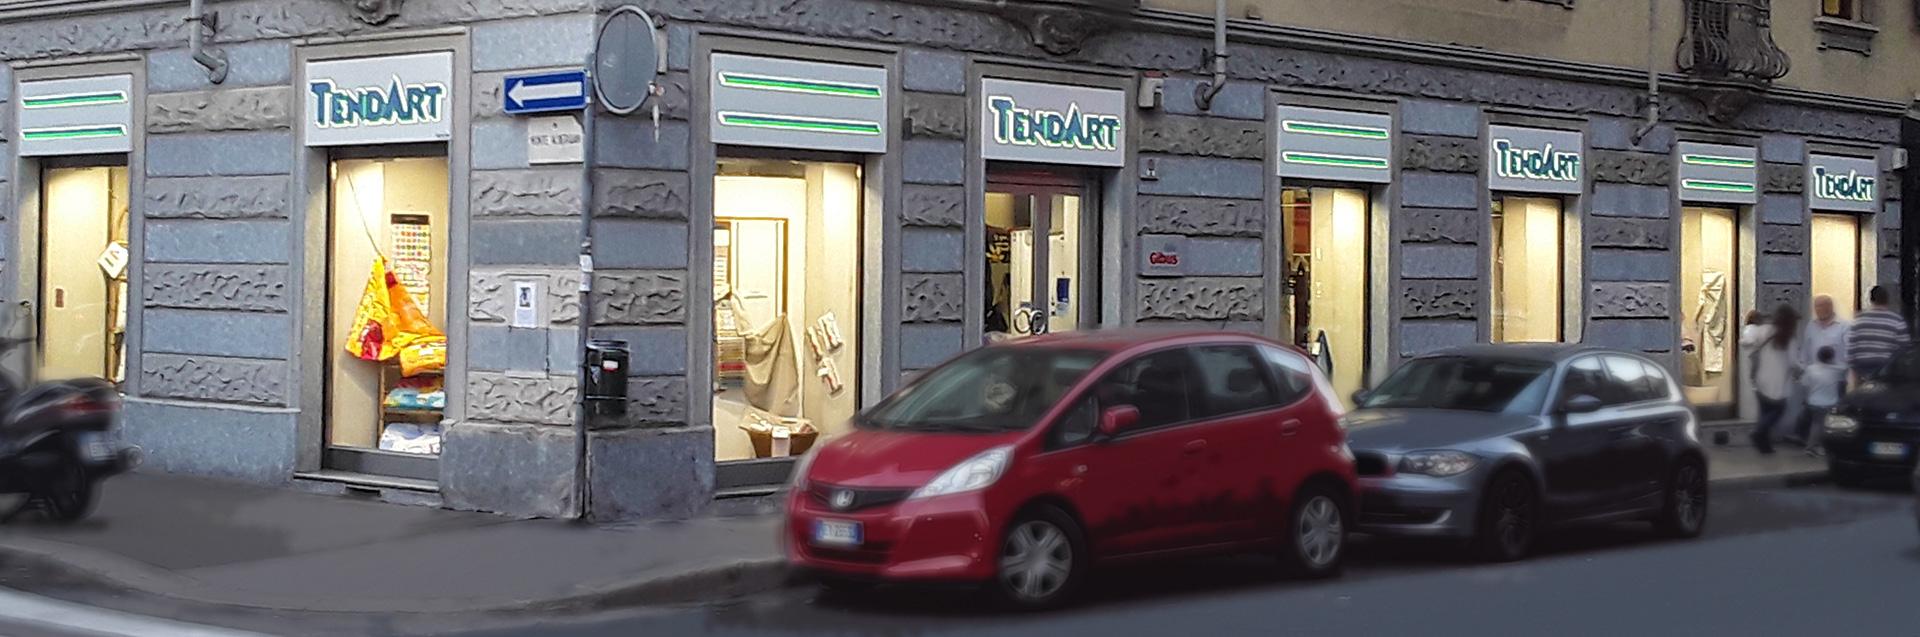 Tende Da Interni Torino : Tende torino da interni e sole tendart